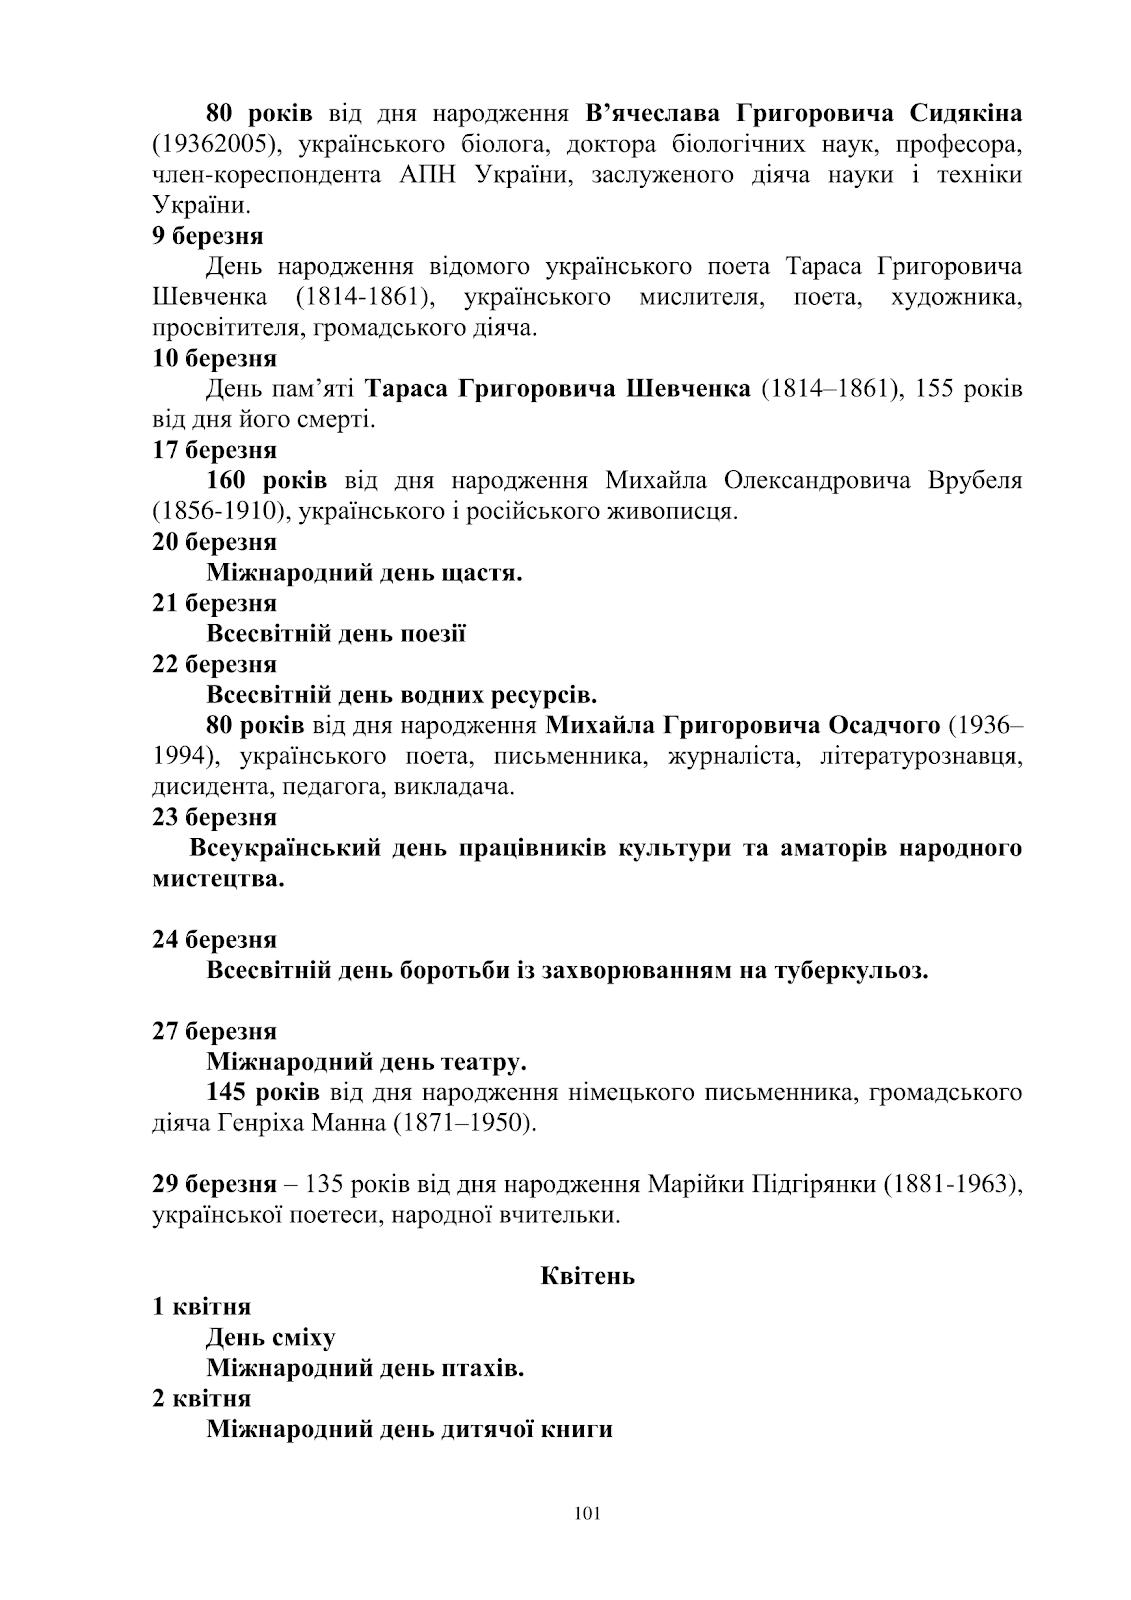 C:\Users\Валерия\Desktop\план 2016 рік\план 2016 рік-101.png